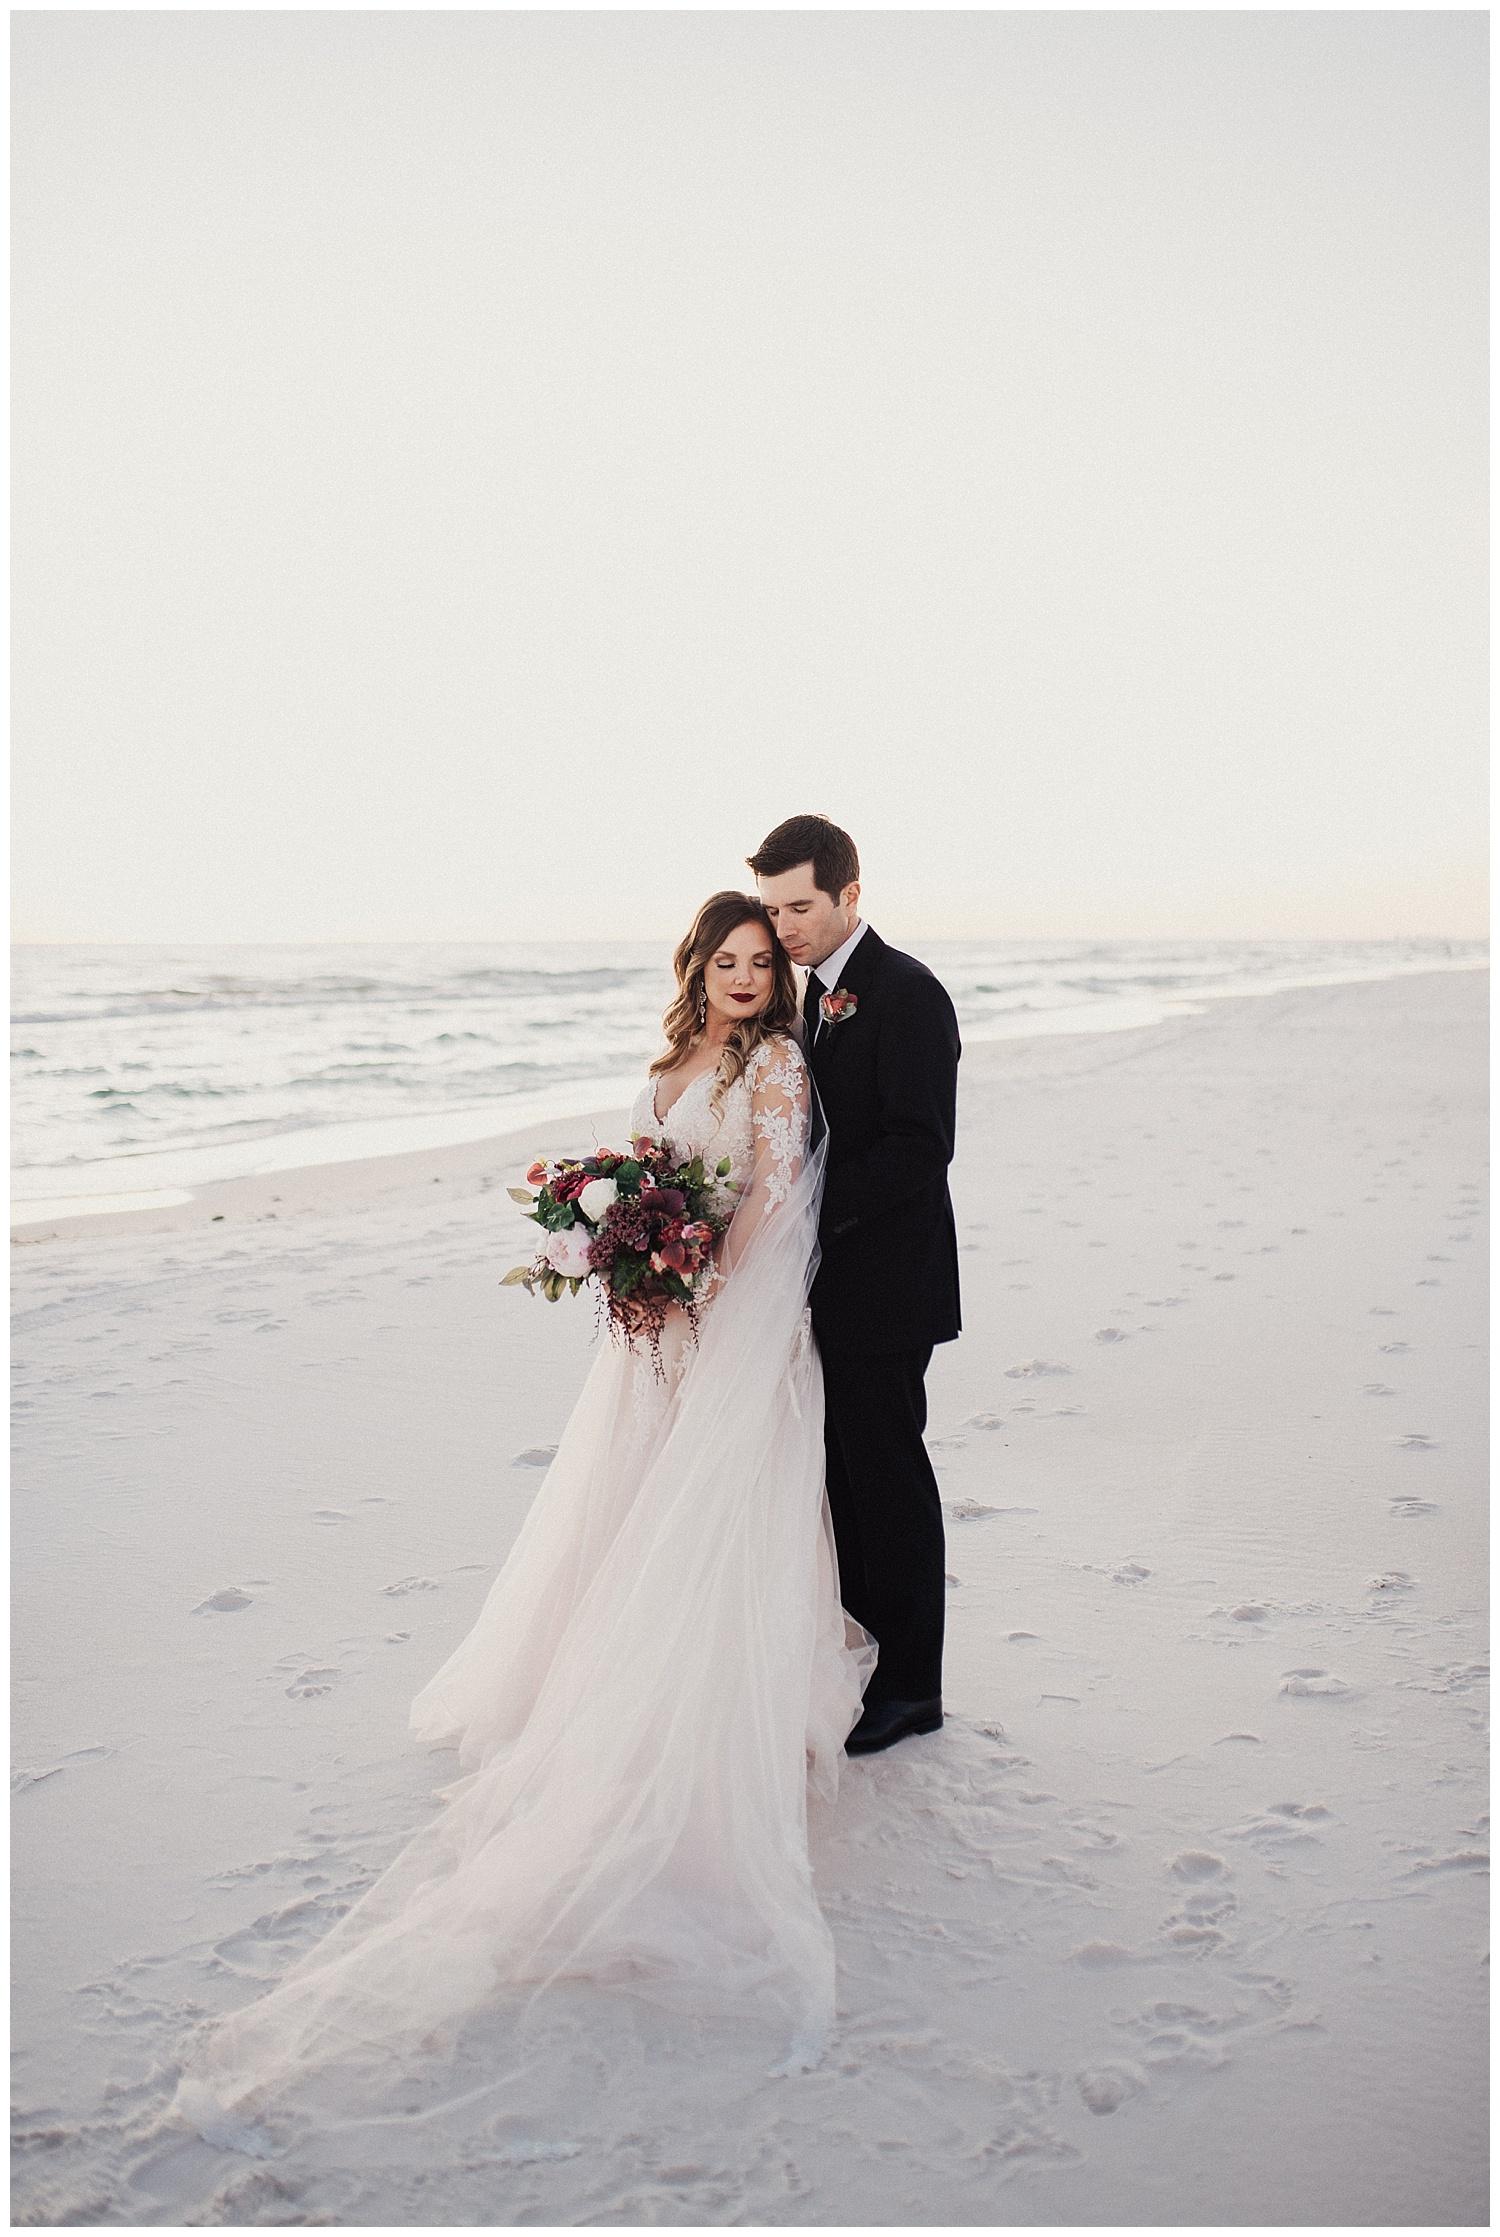 Beach wedding in Florida